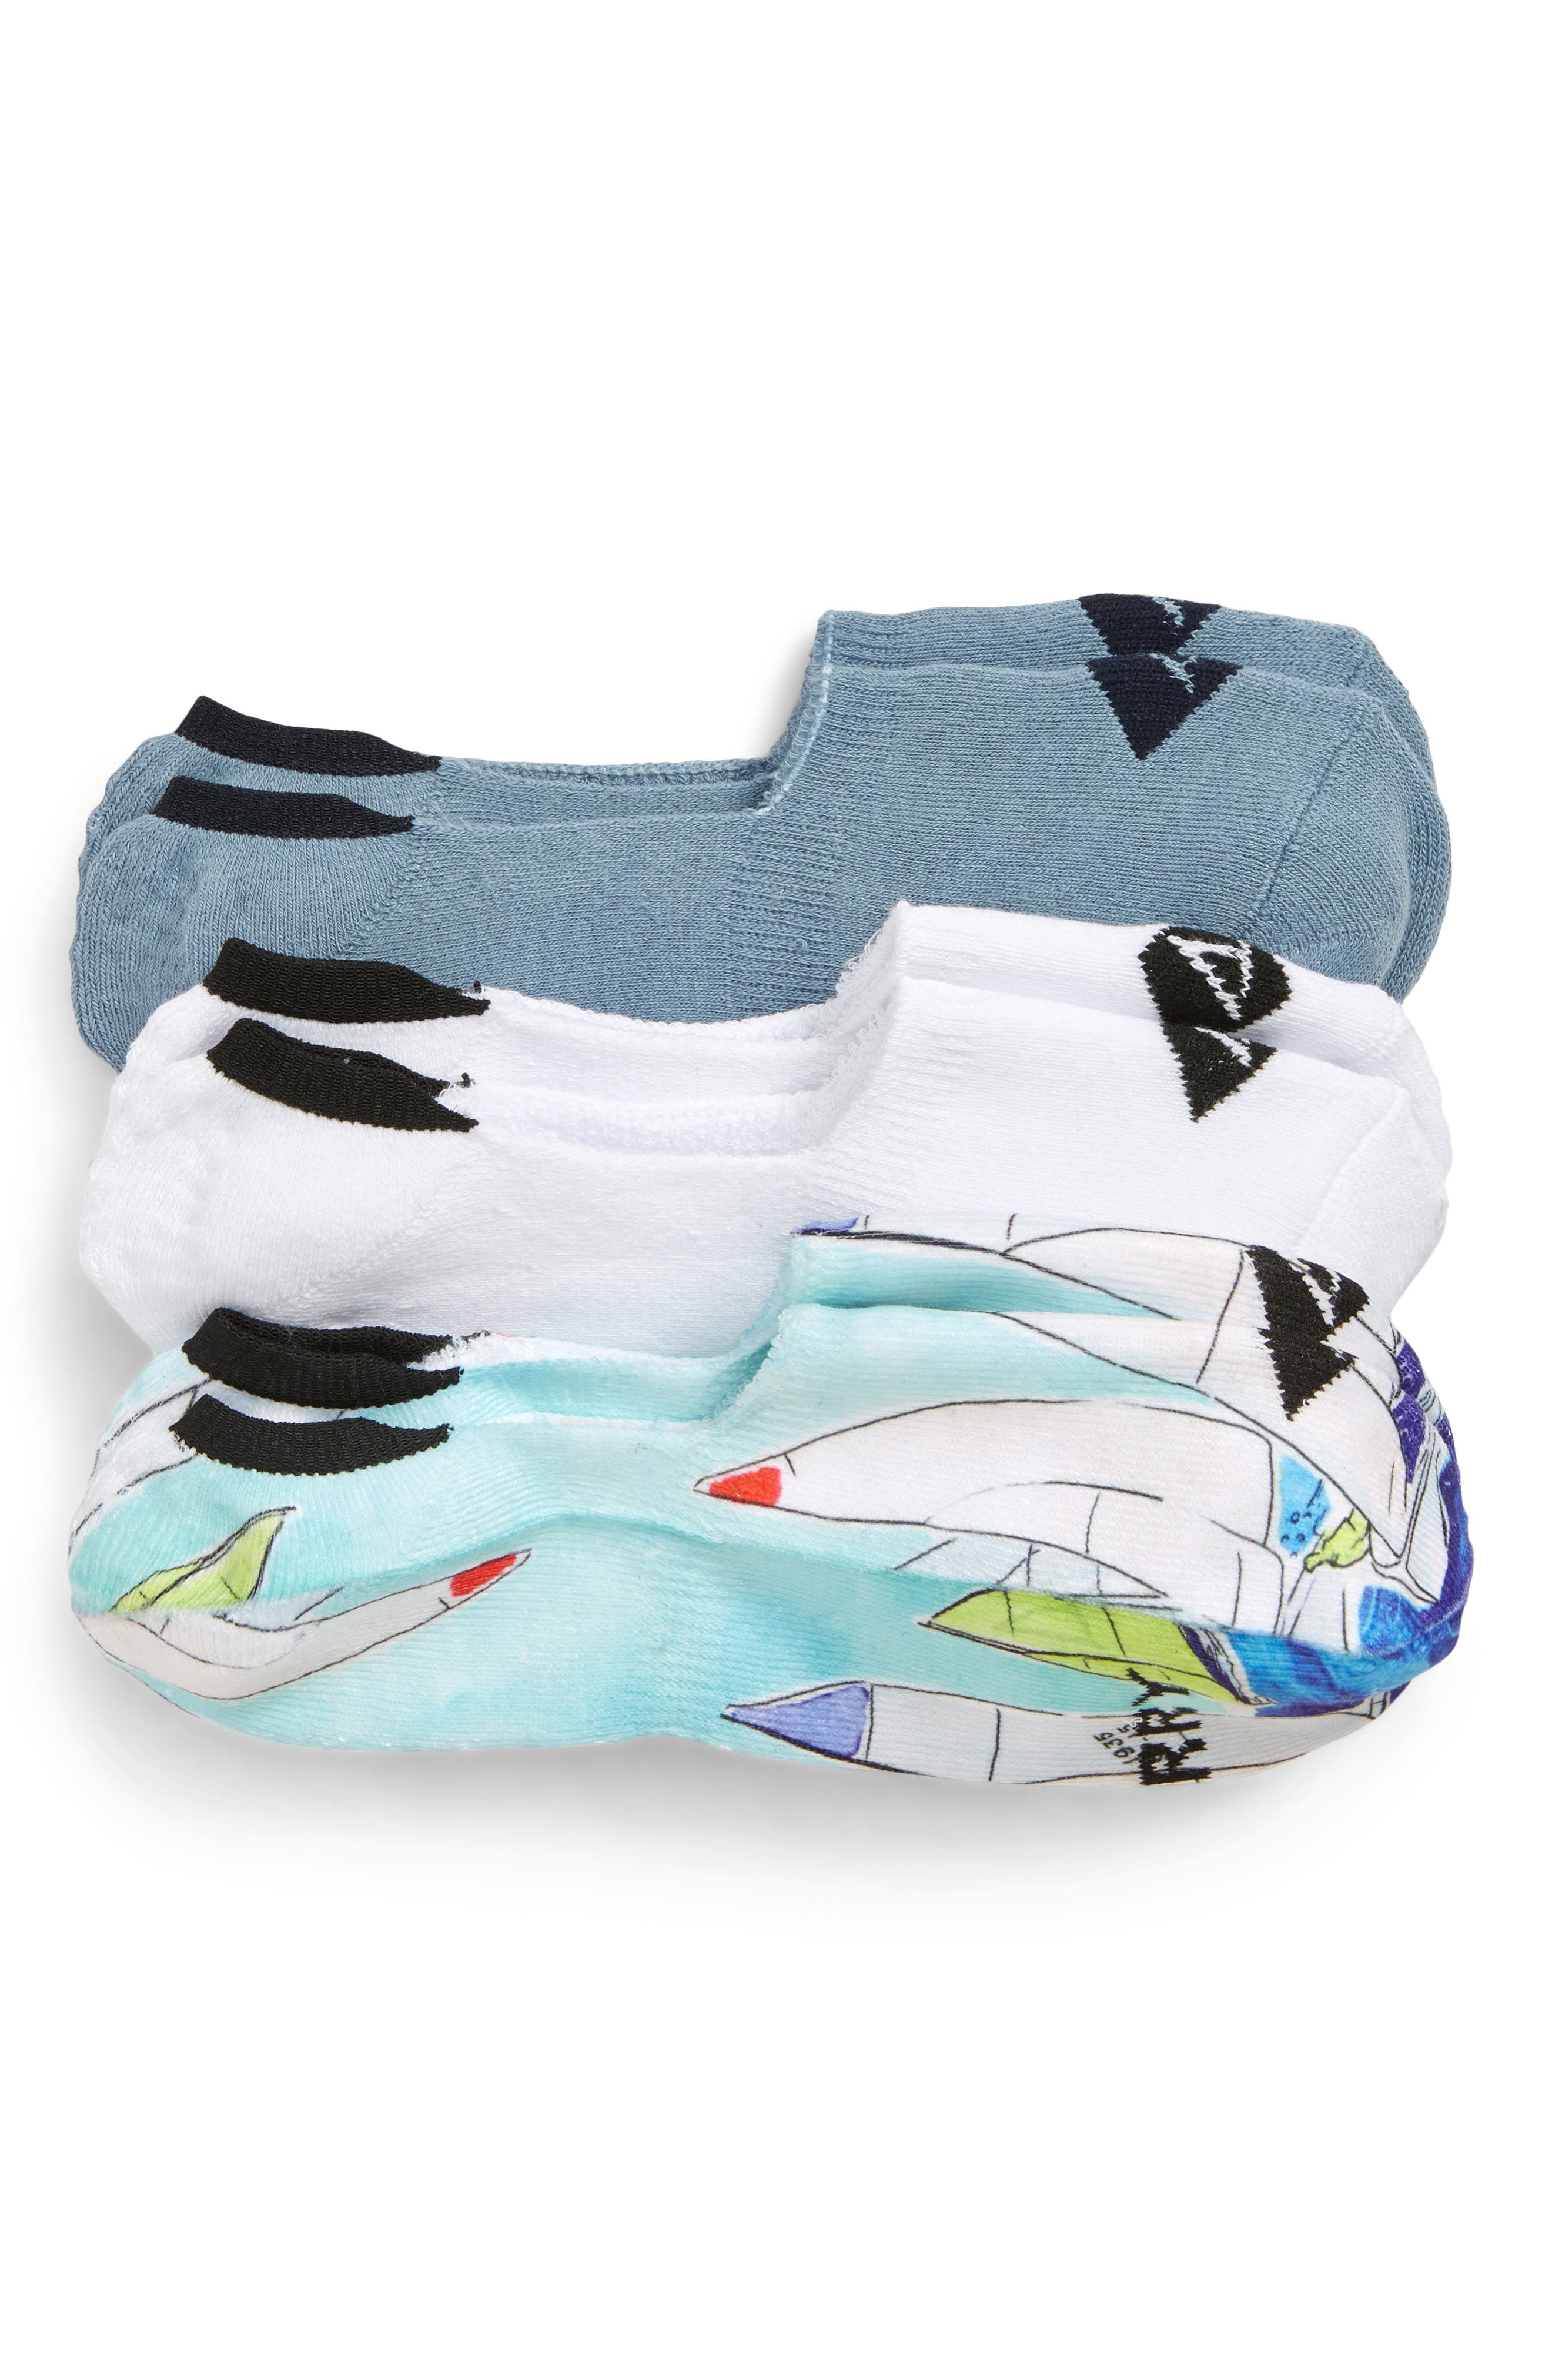 ,                             Top-Sider<sup>®</sup> Regatta Assorted 3-Pack Liner Socks,                             Main thumbnail 1, color,                             BLUE ASST